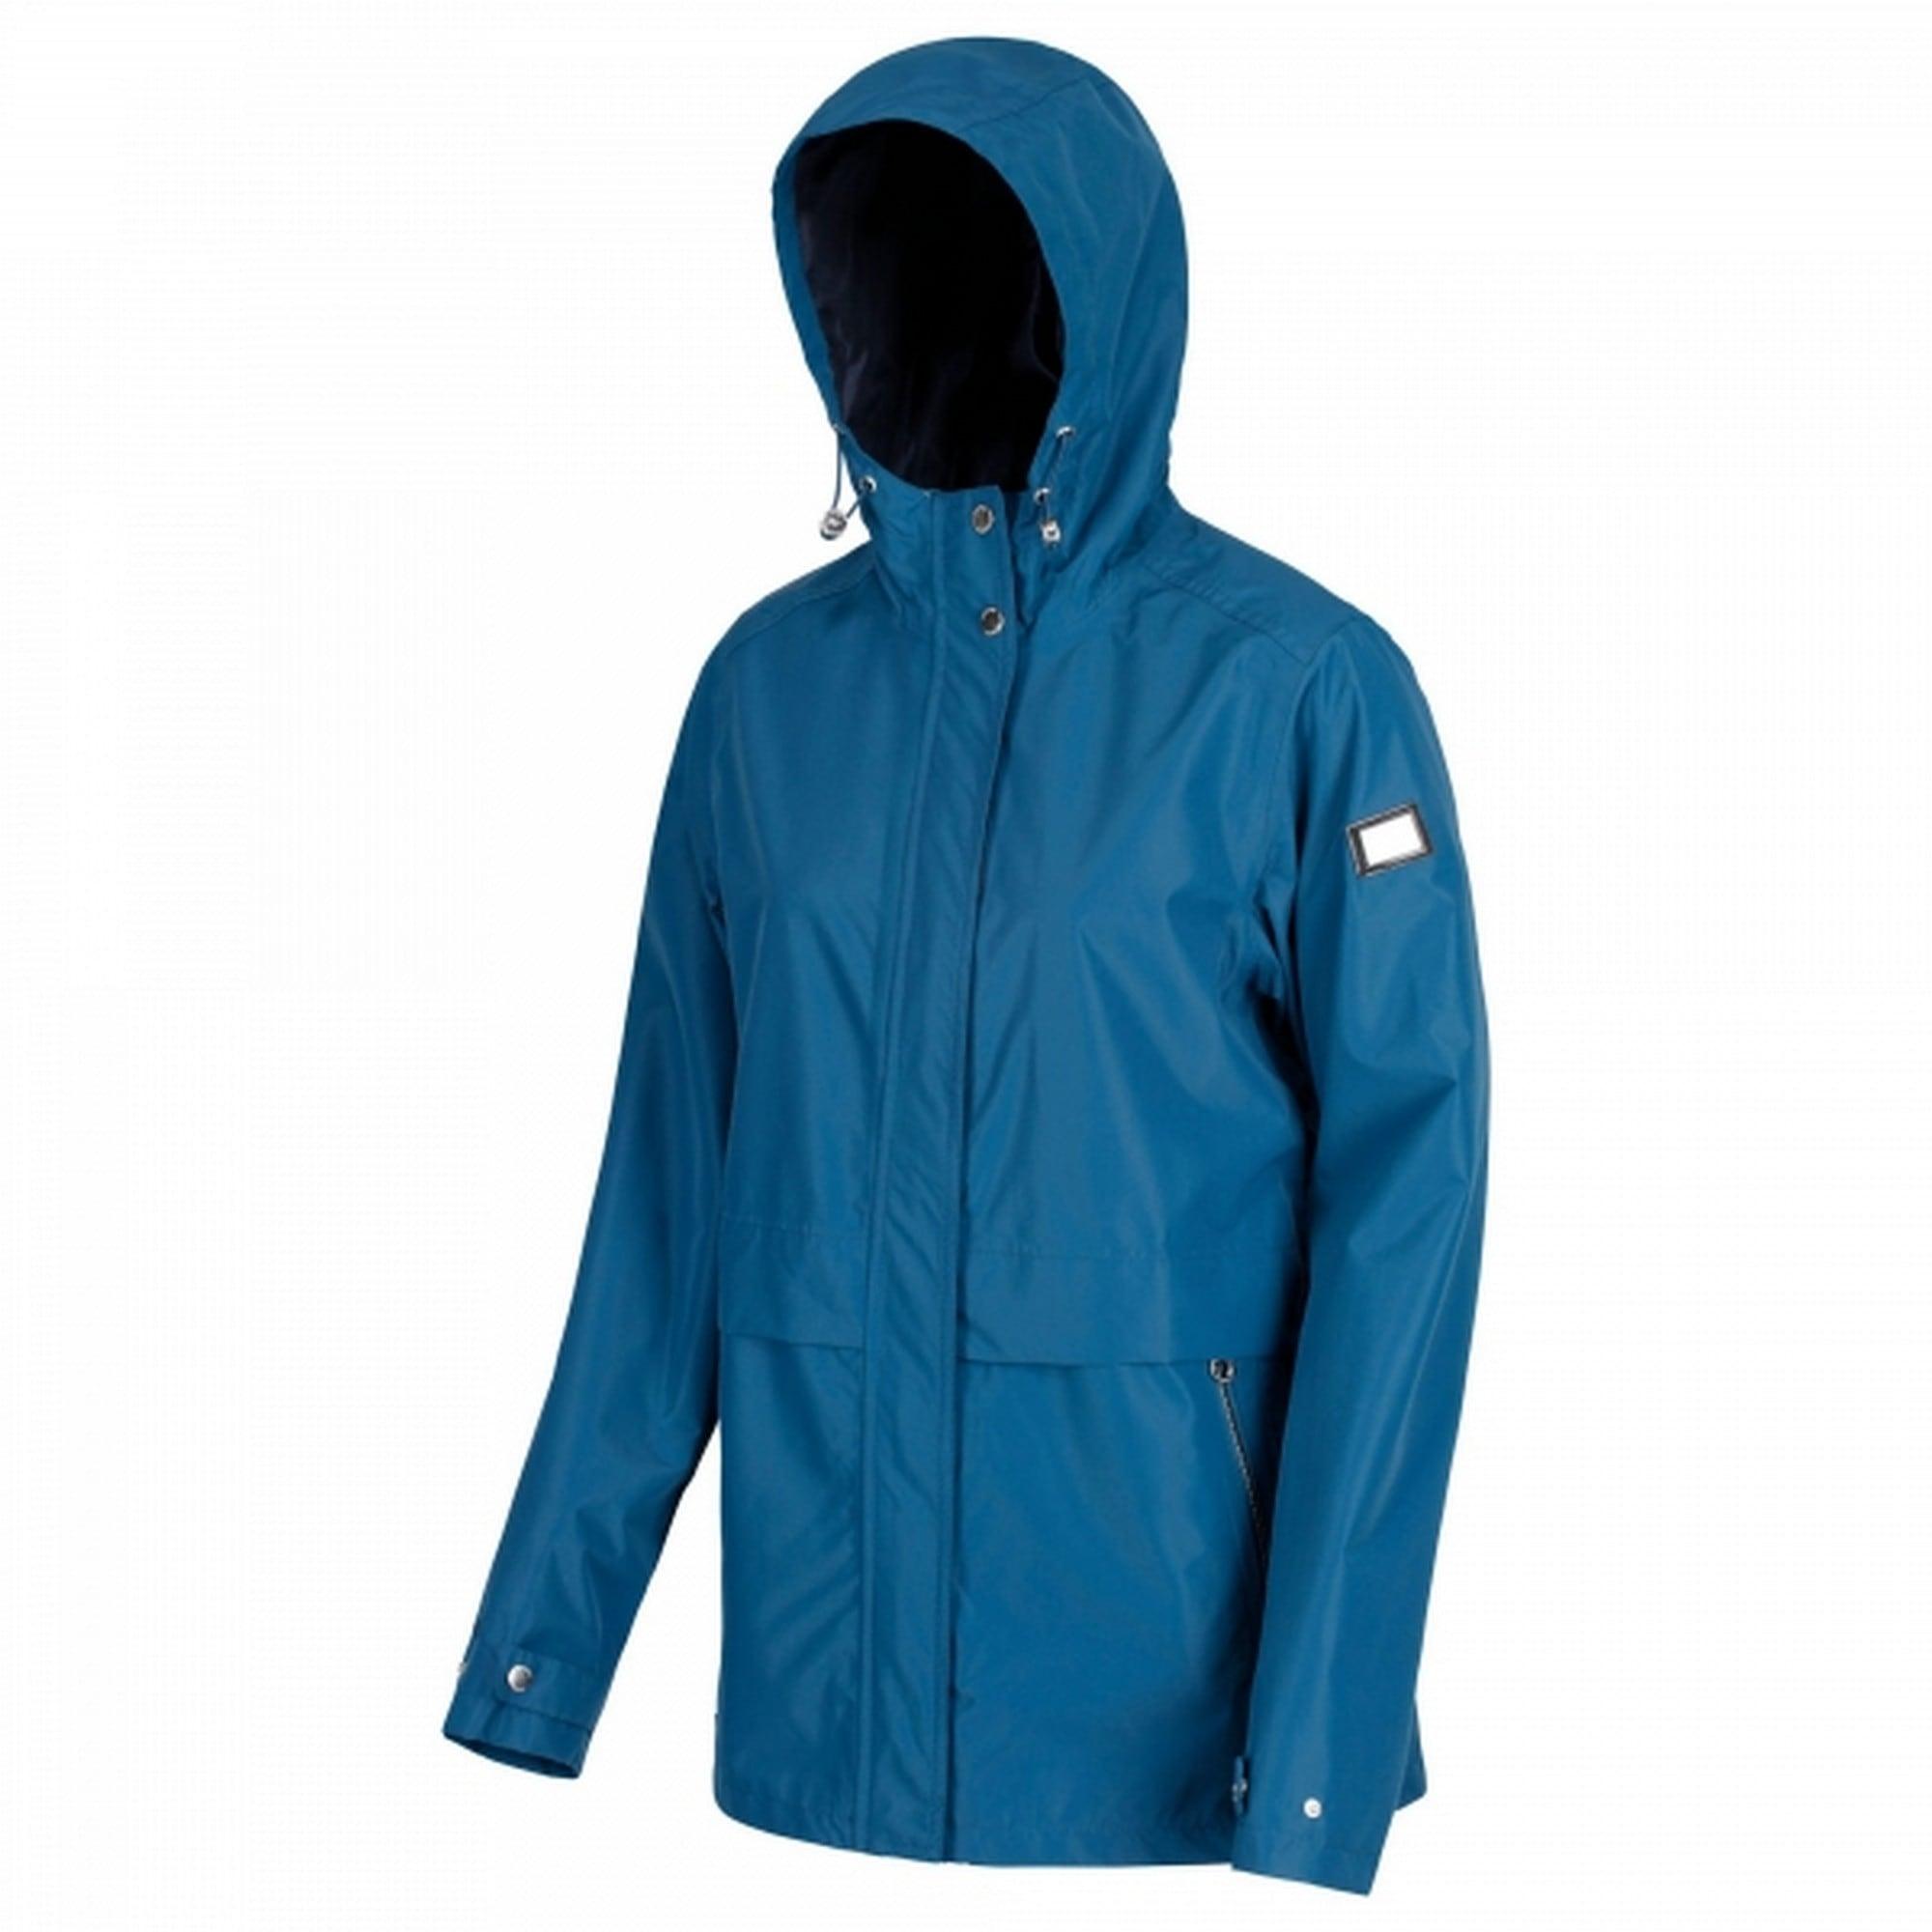 Regatta Outdoorjacke Damen Jacke Bidelia mit Kapuze | Sportbekleidung > Sportjacken > Outdoorjacken | Blau | Polyester - Taft | Regatta